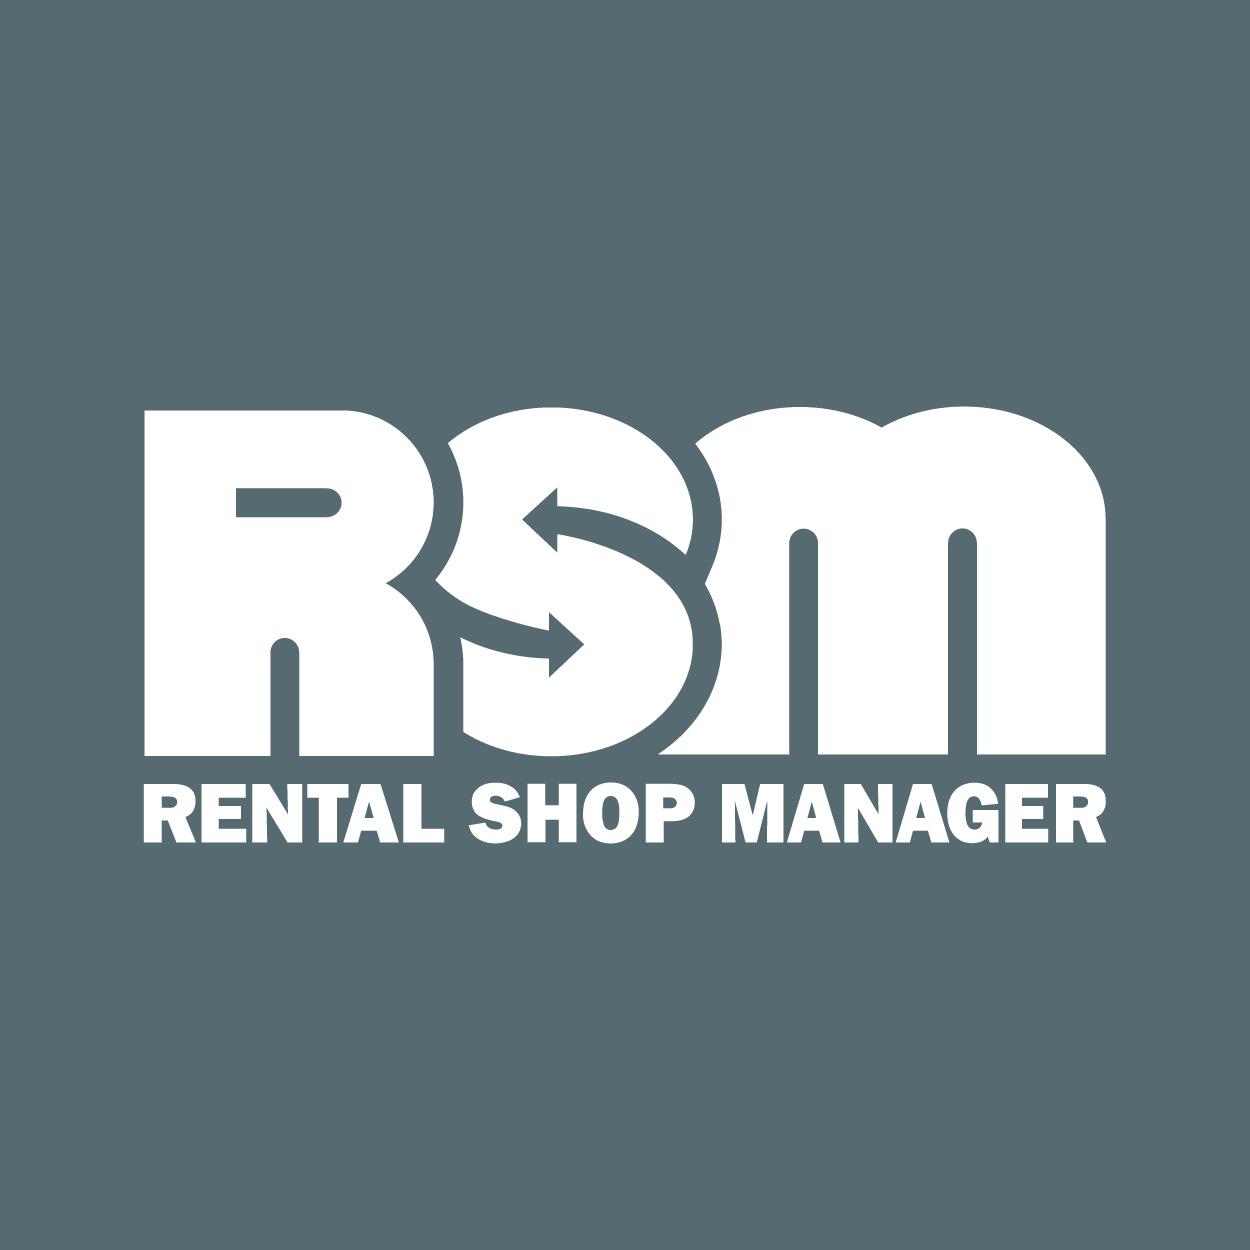 https://www.lightspeedhq.com.au/wp-content/uploads/2016/04/RSM_logo_reversed.jpg